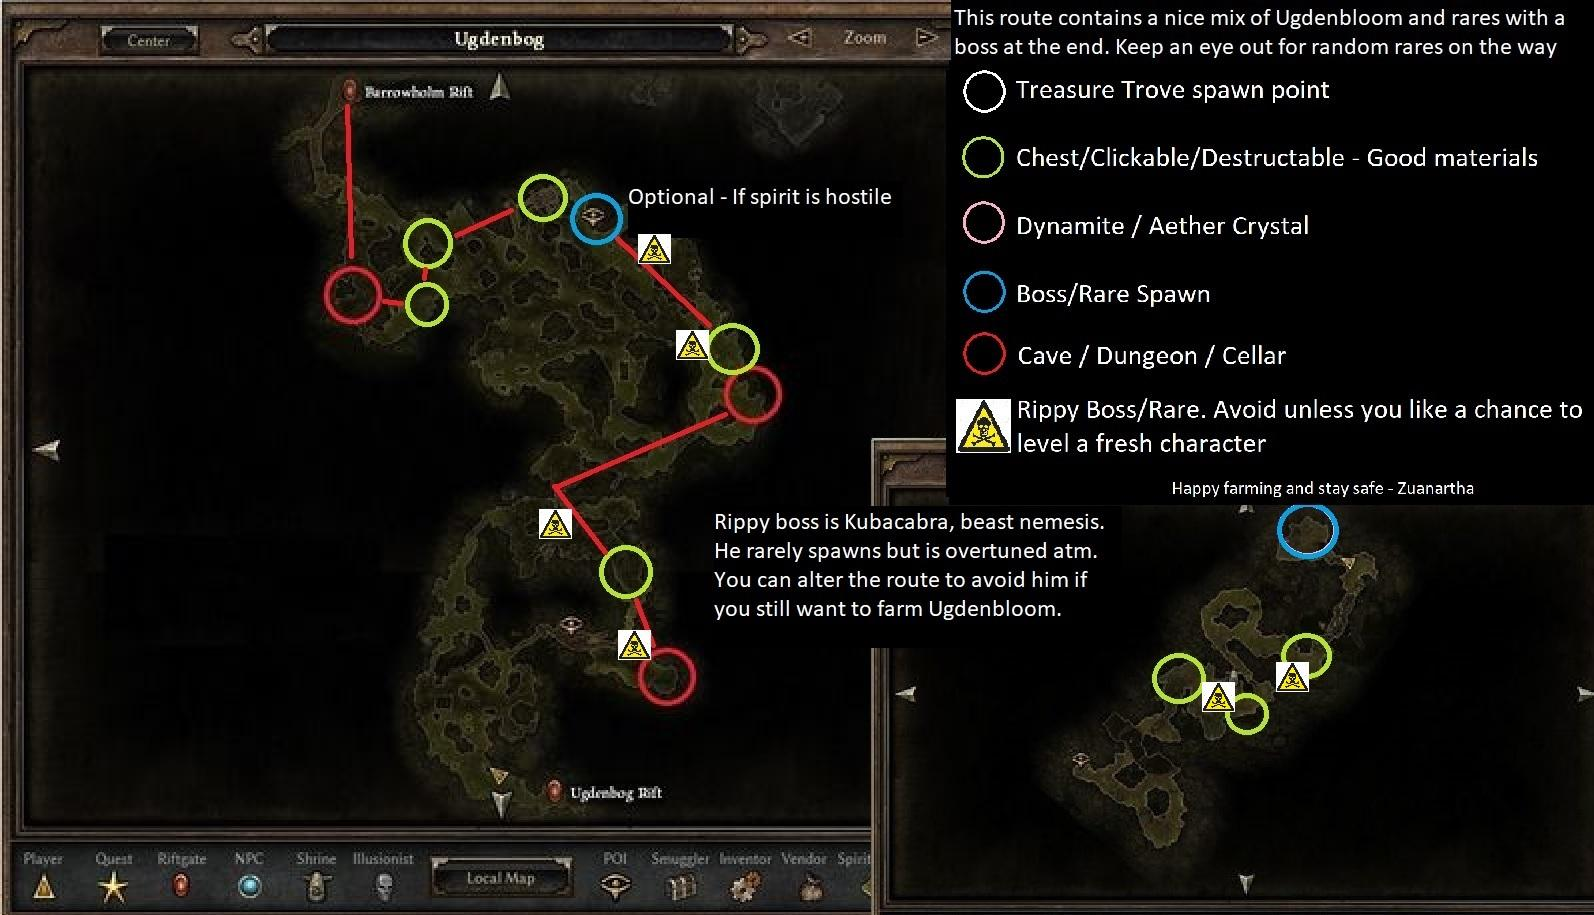 Grim Dawn - Optimized Farming Routes